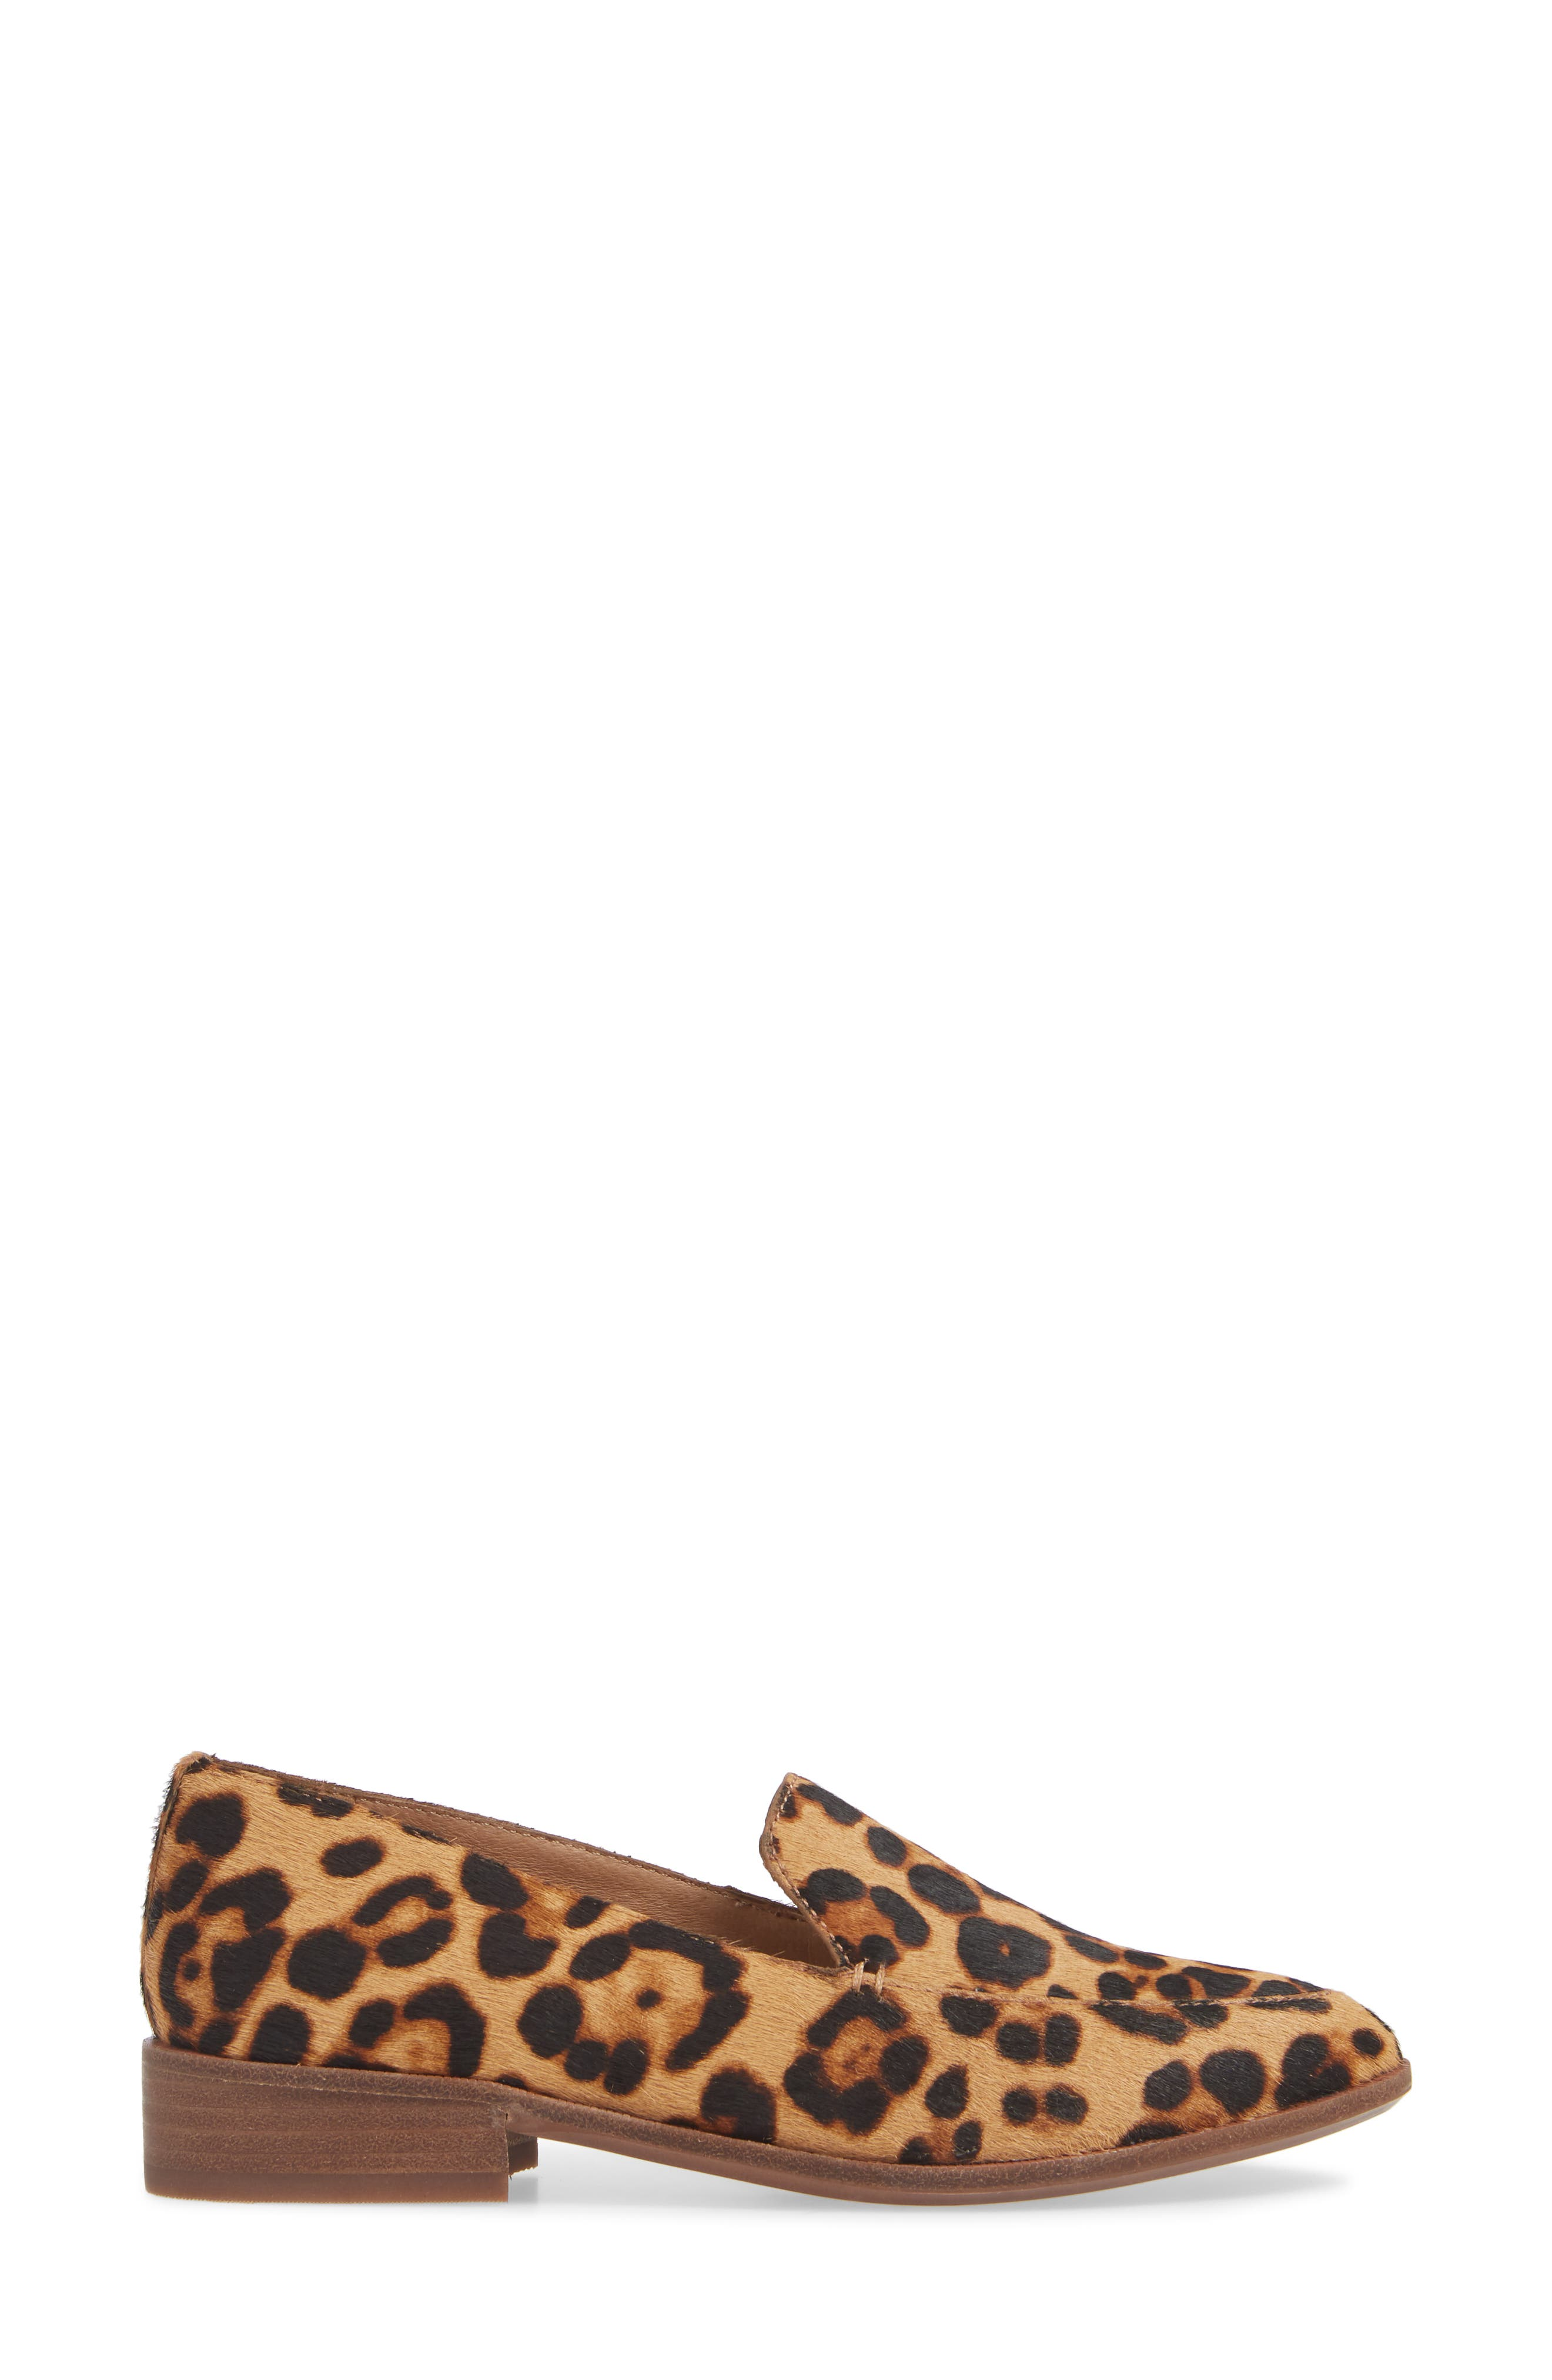 MADEWELL,                             The Frances Genuine Calf Hair Loafer,                             Alternate thumbnail 3, color,                             TRUFFLE MULTI LEOPARD CALFHAIR